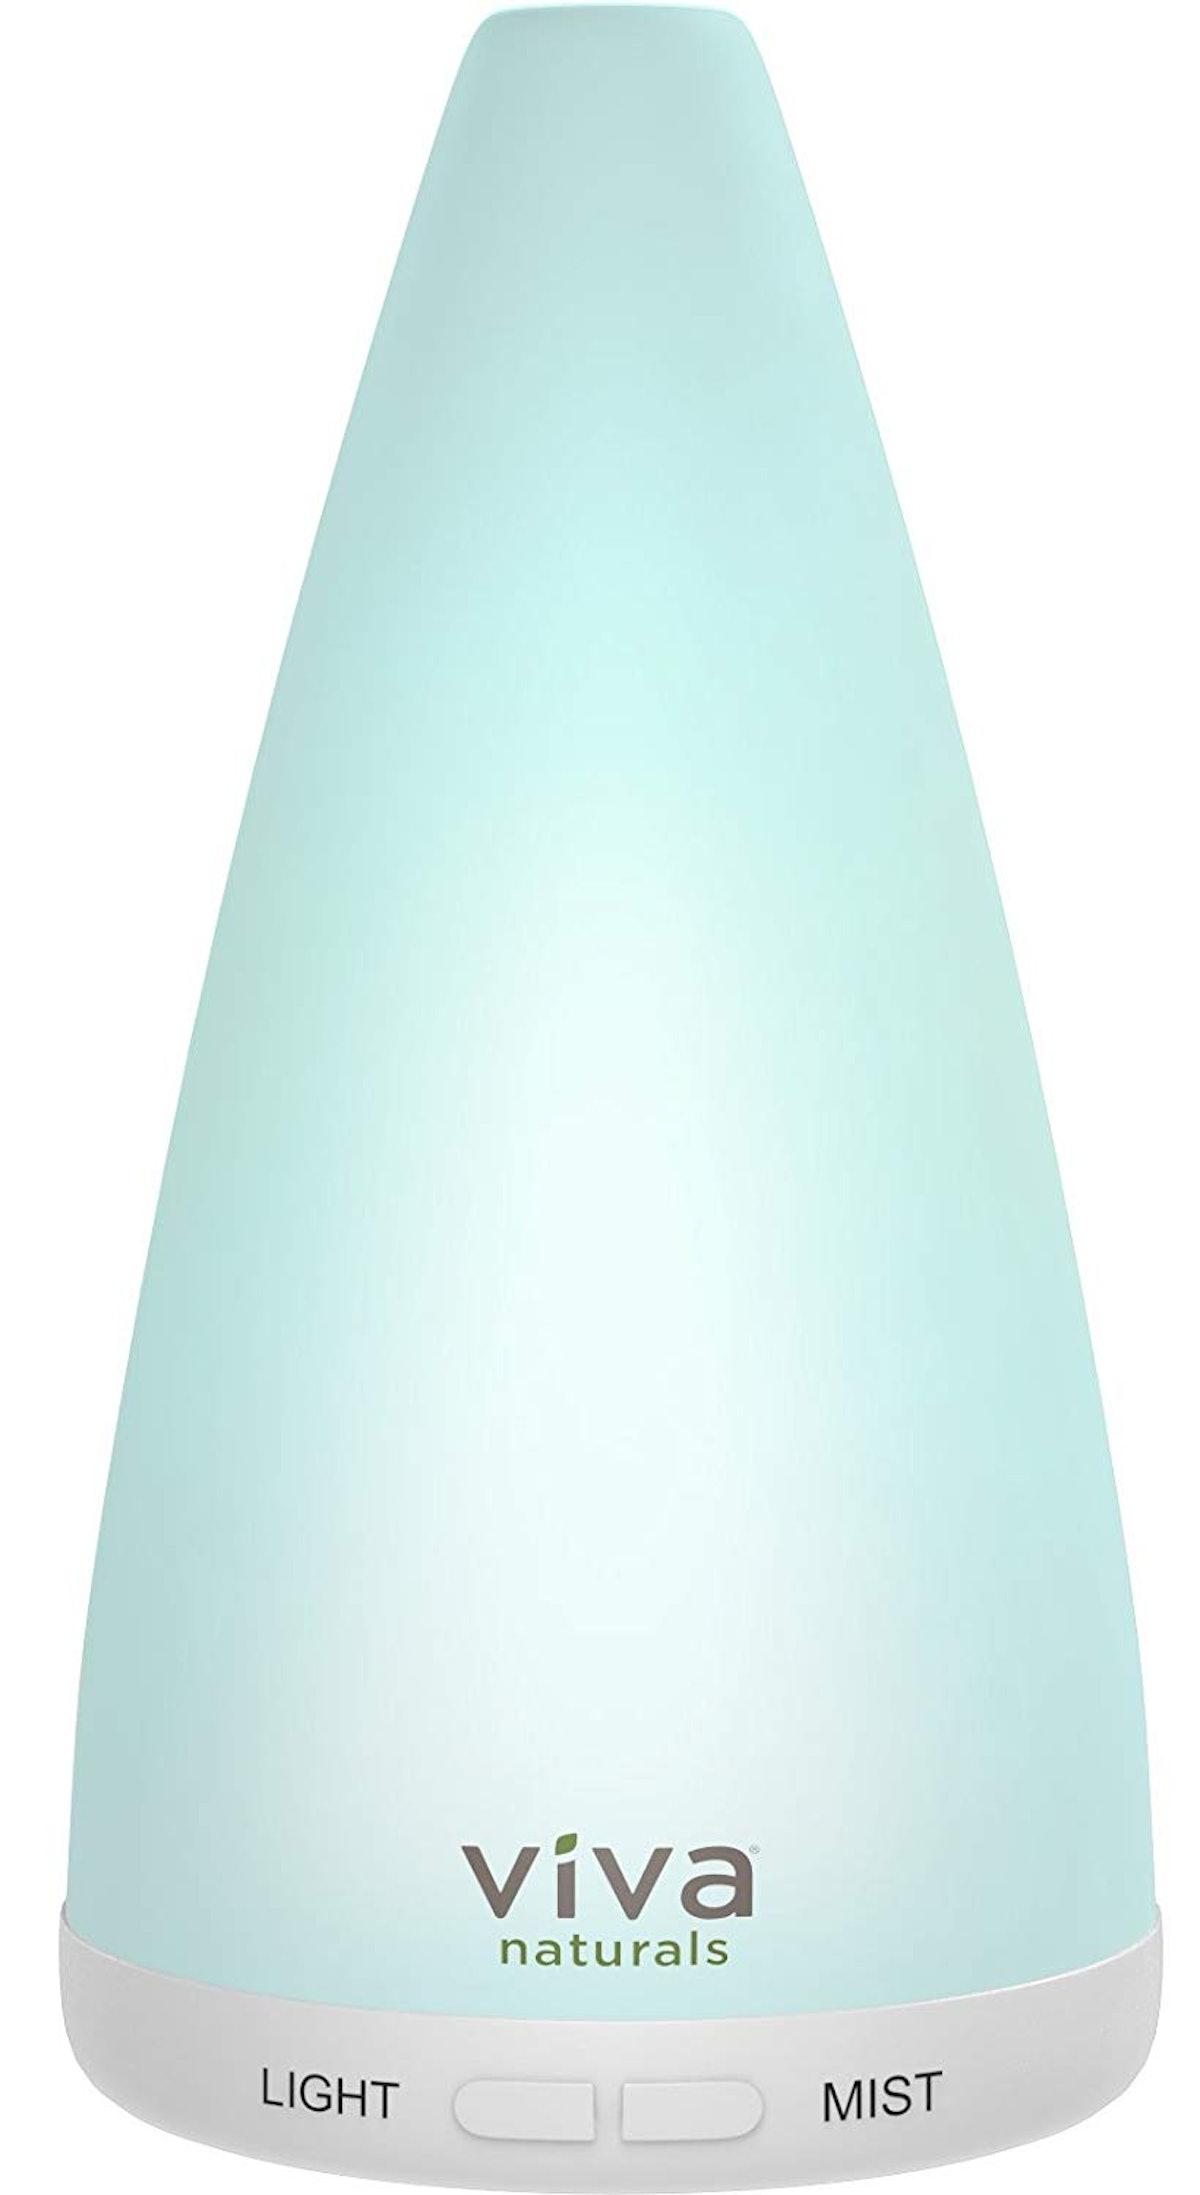 Viva Naturals Aromatherapy Essential Oil Diffuser